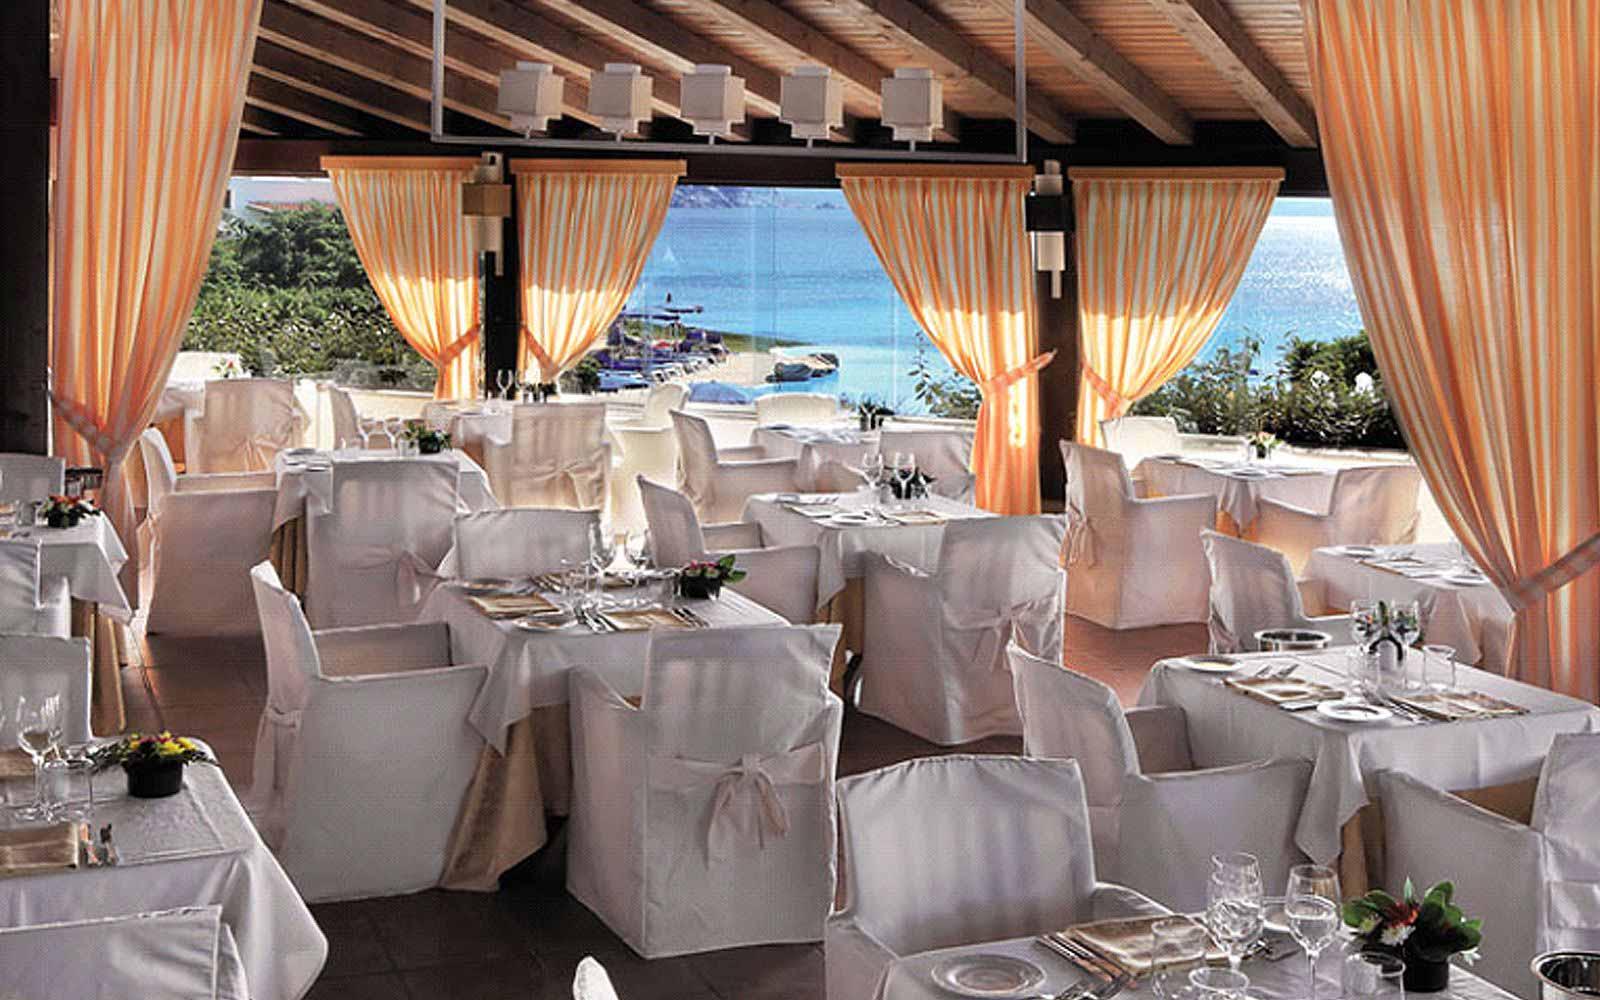 Restaurant at the Colonna Grand Hotel Capo Testa